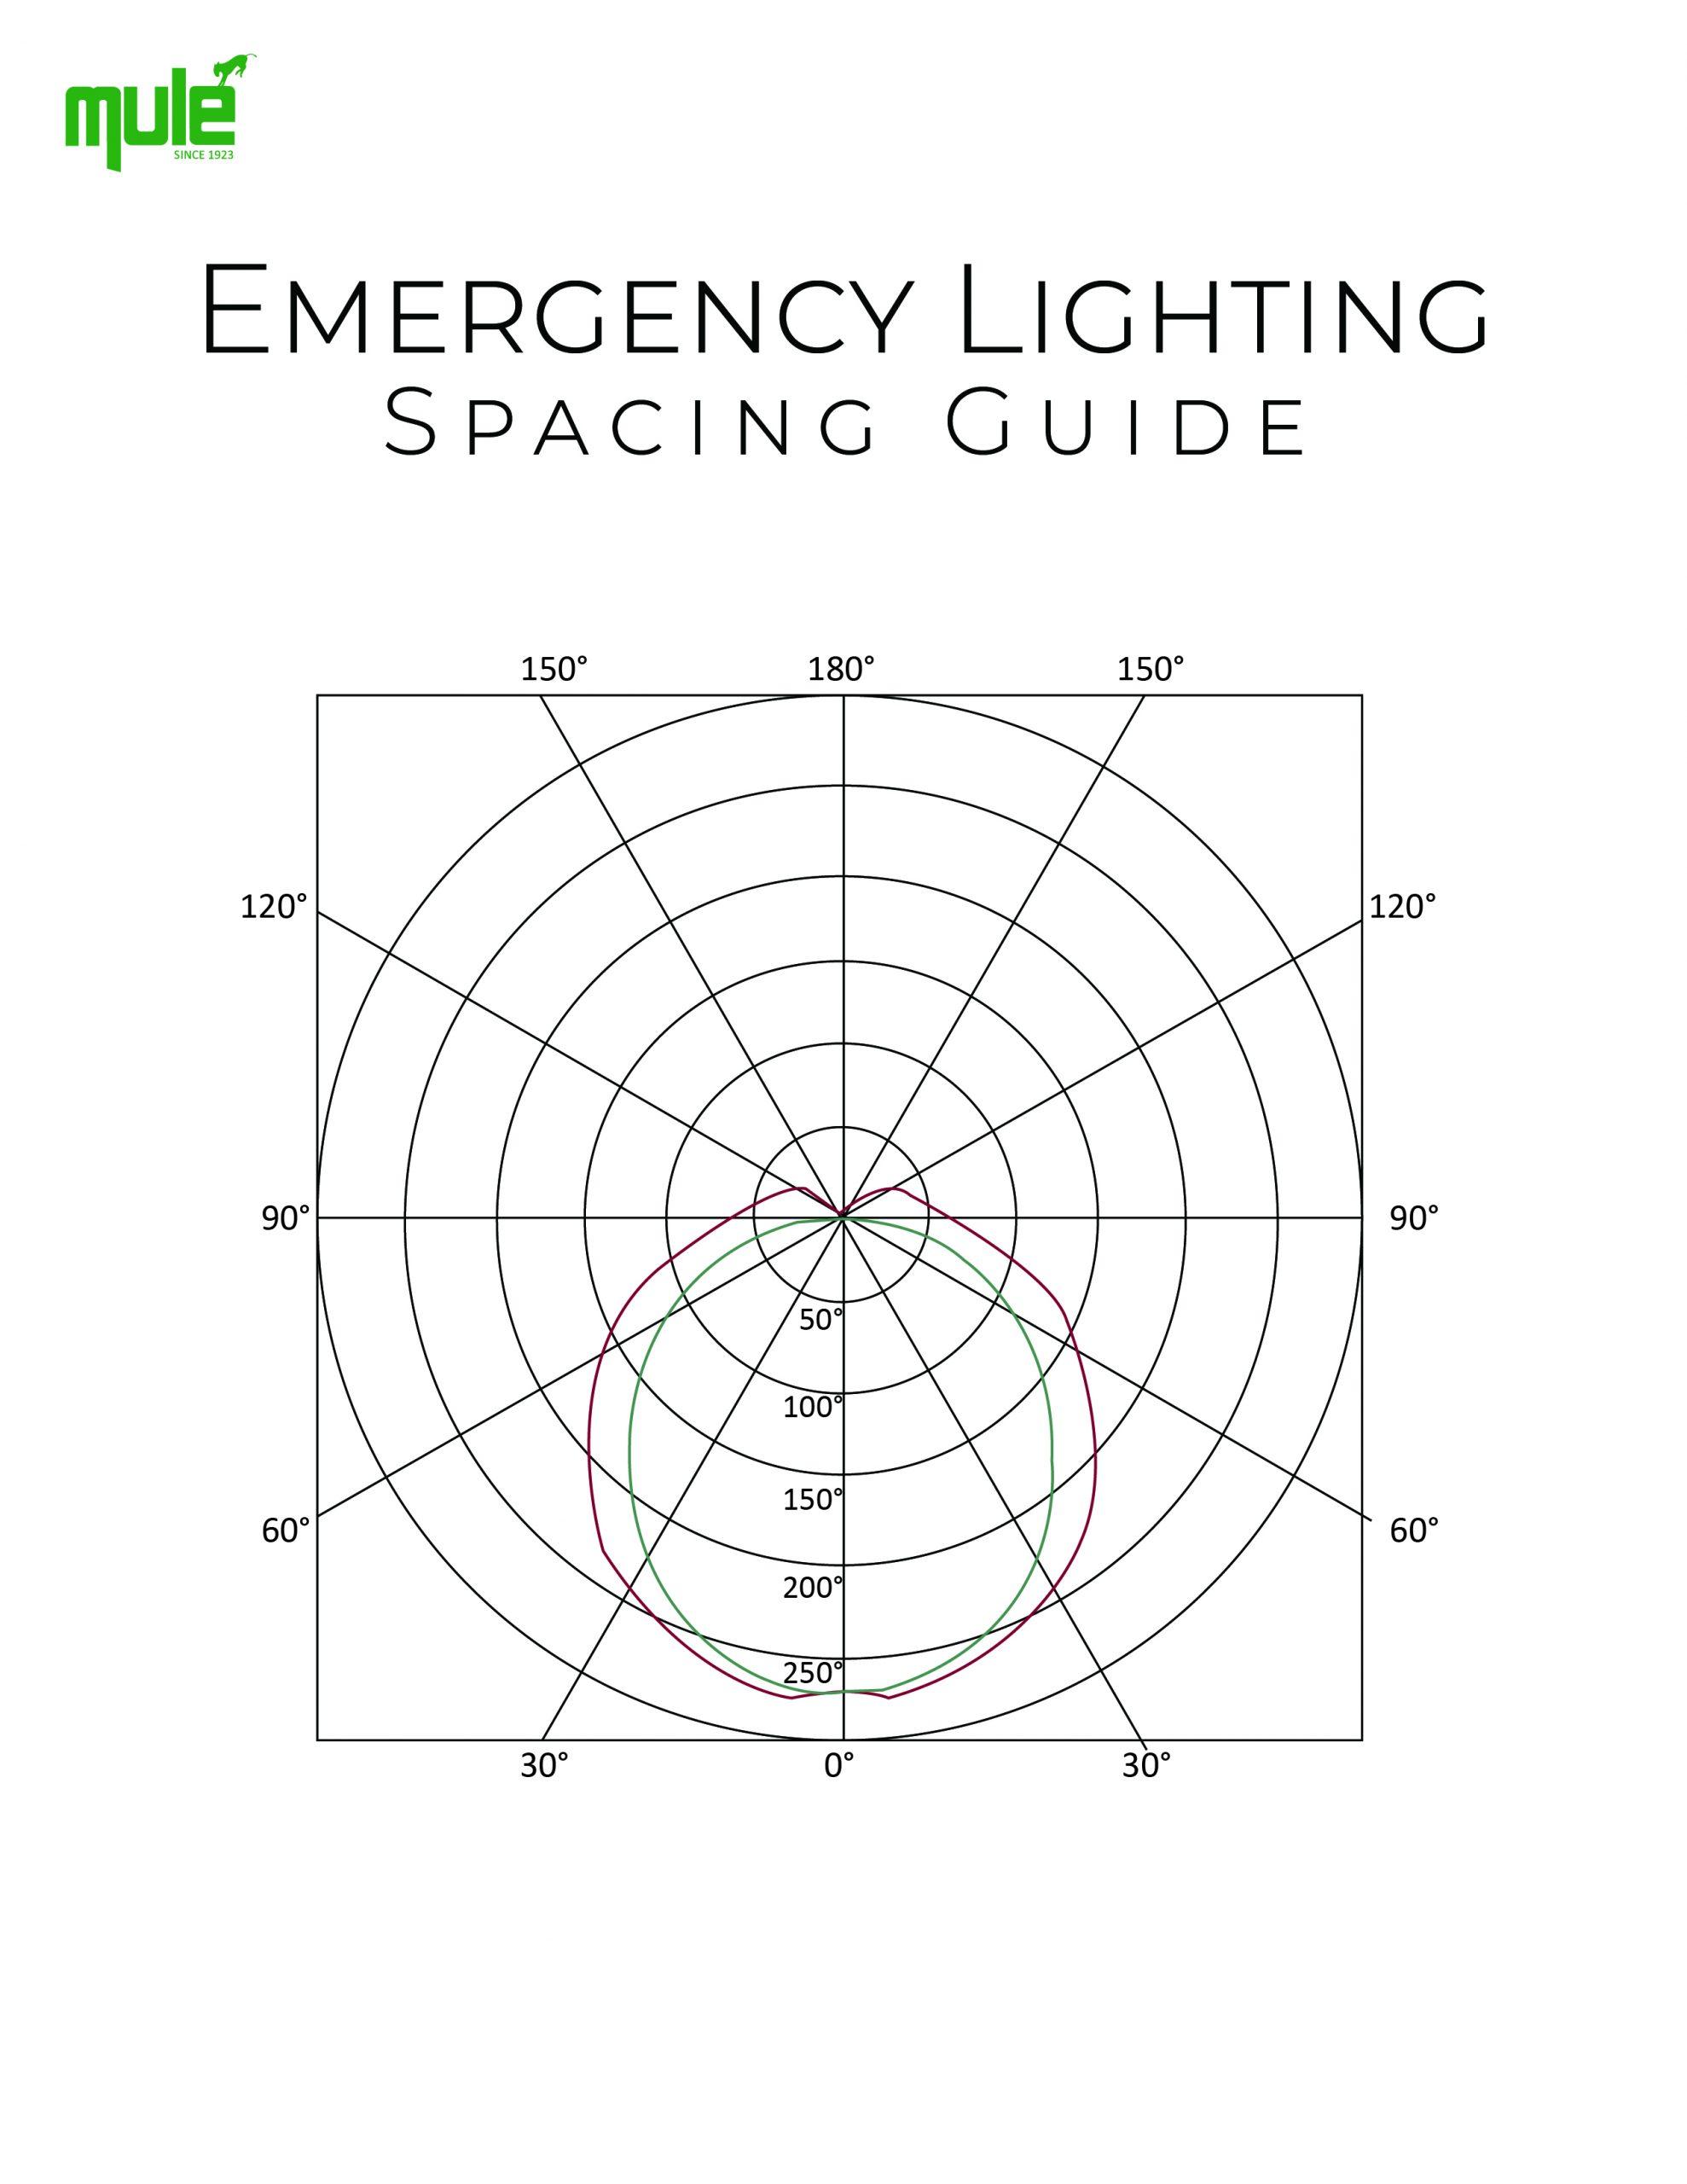 Mule Lighting CEL Exit Sign